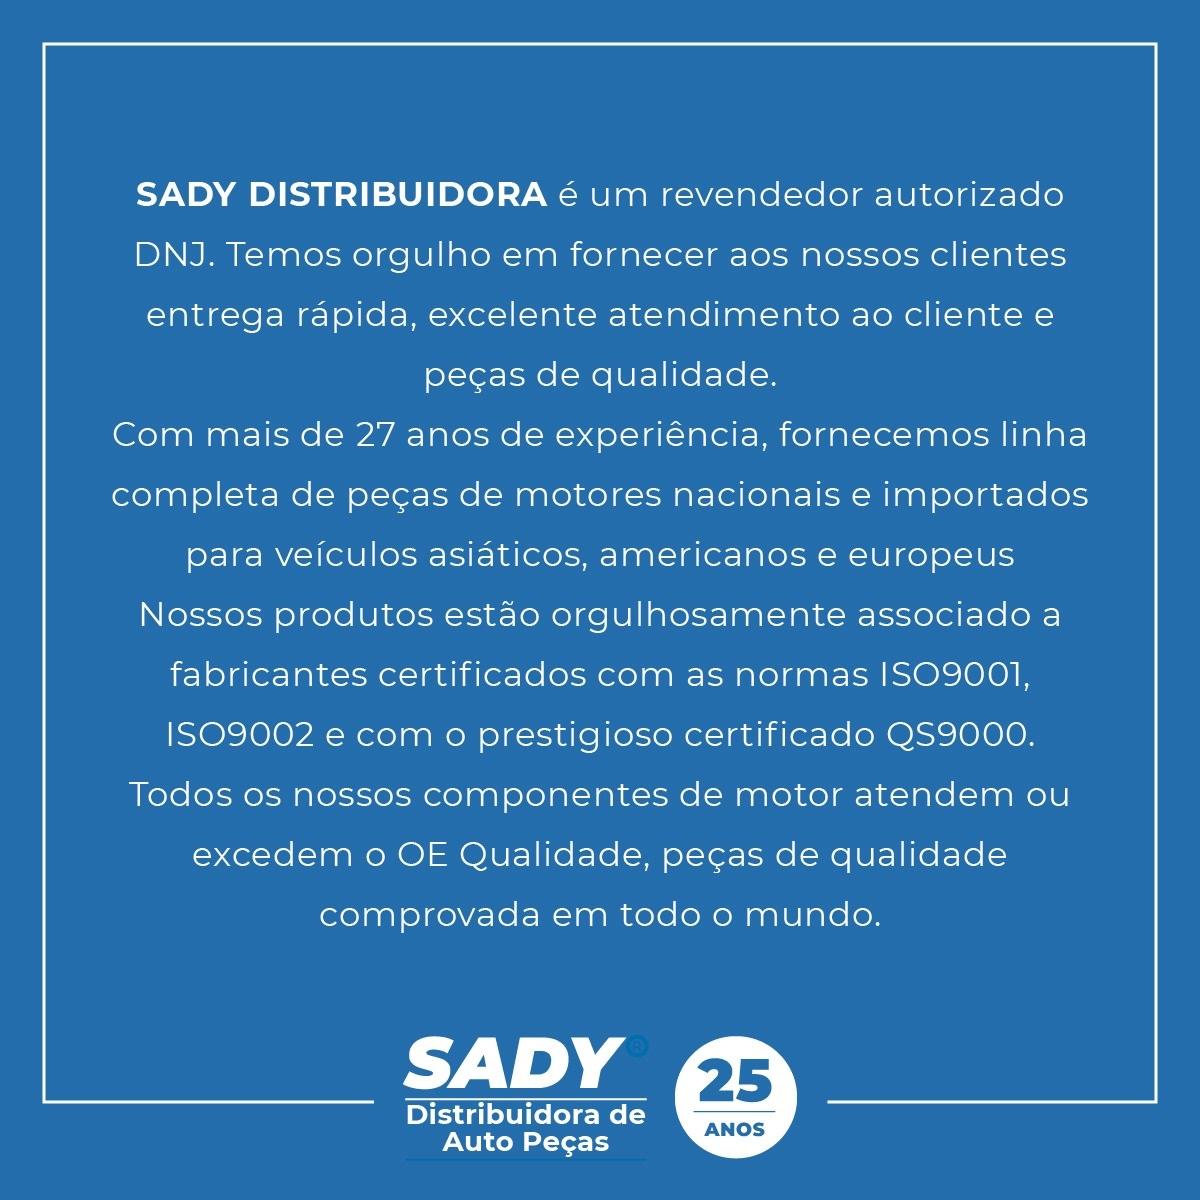 BOMBA DE OLEO DO MOTOR GM 6.5 SILVERADO TD